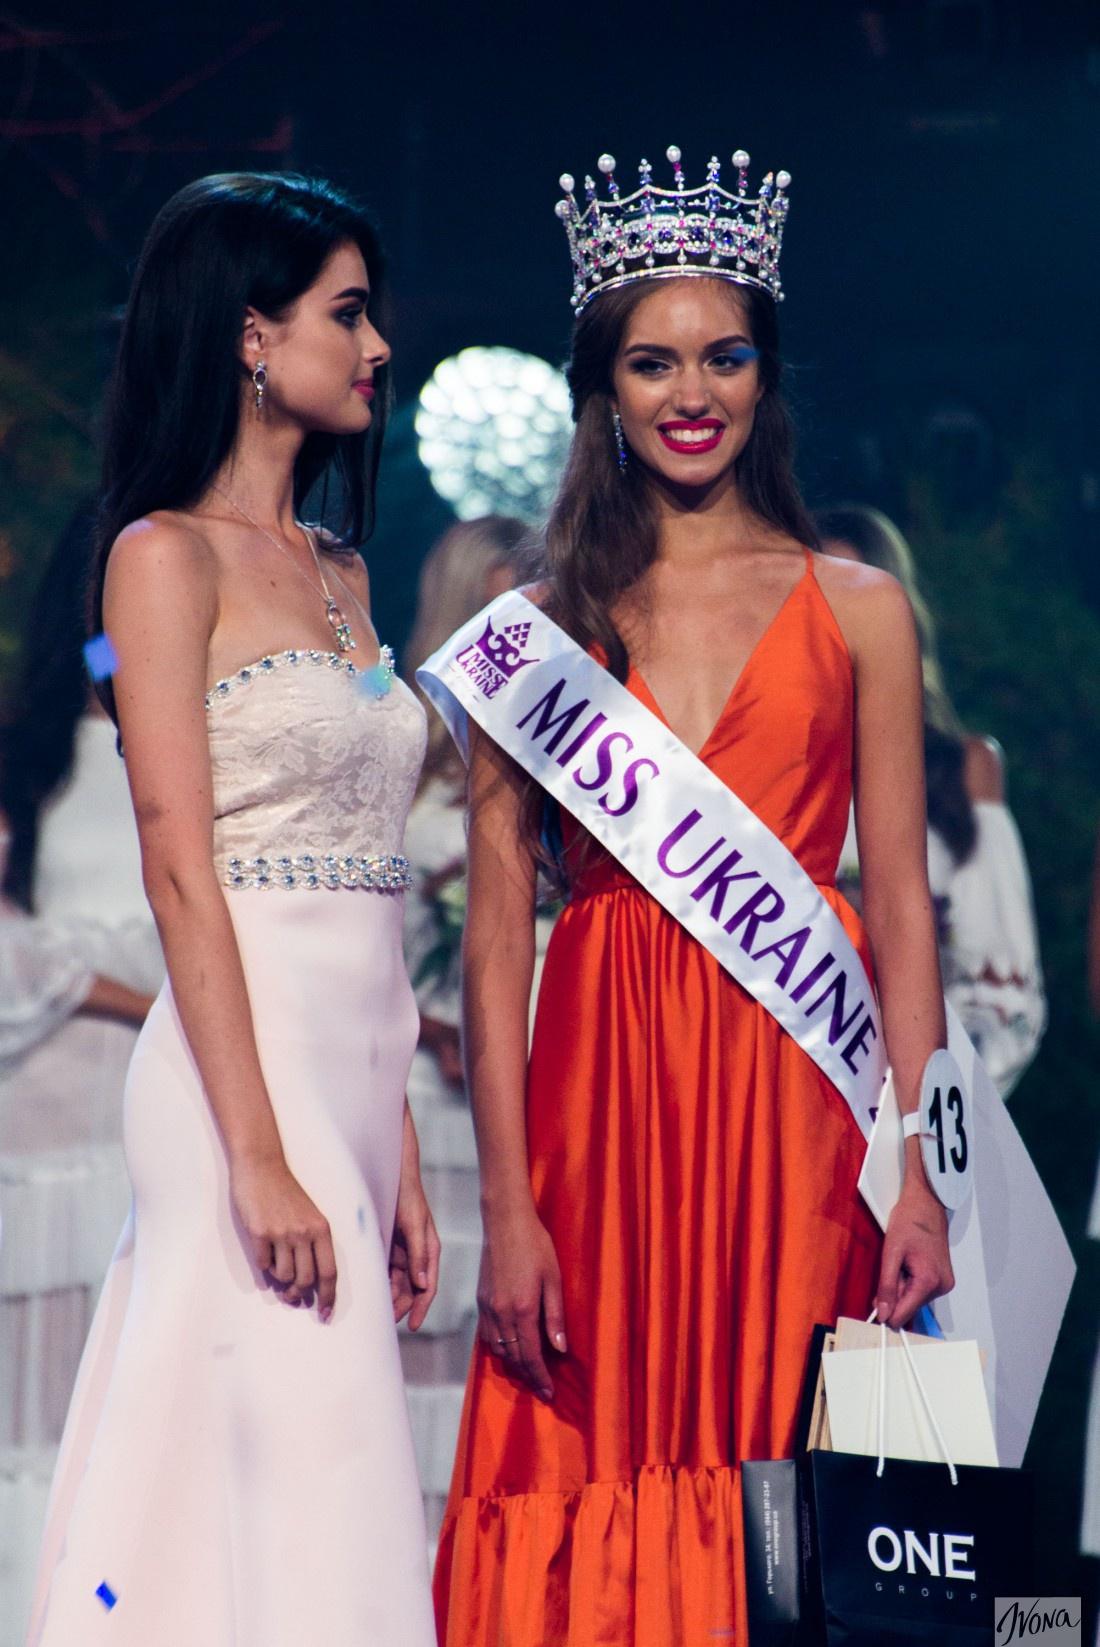 Александра Кучеренко стала Мисс Украина 2016